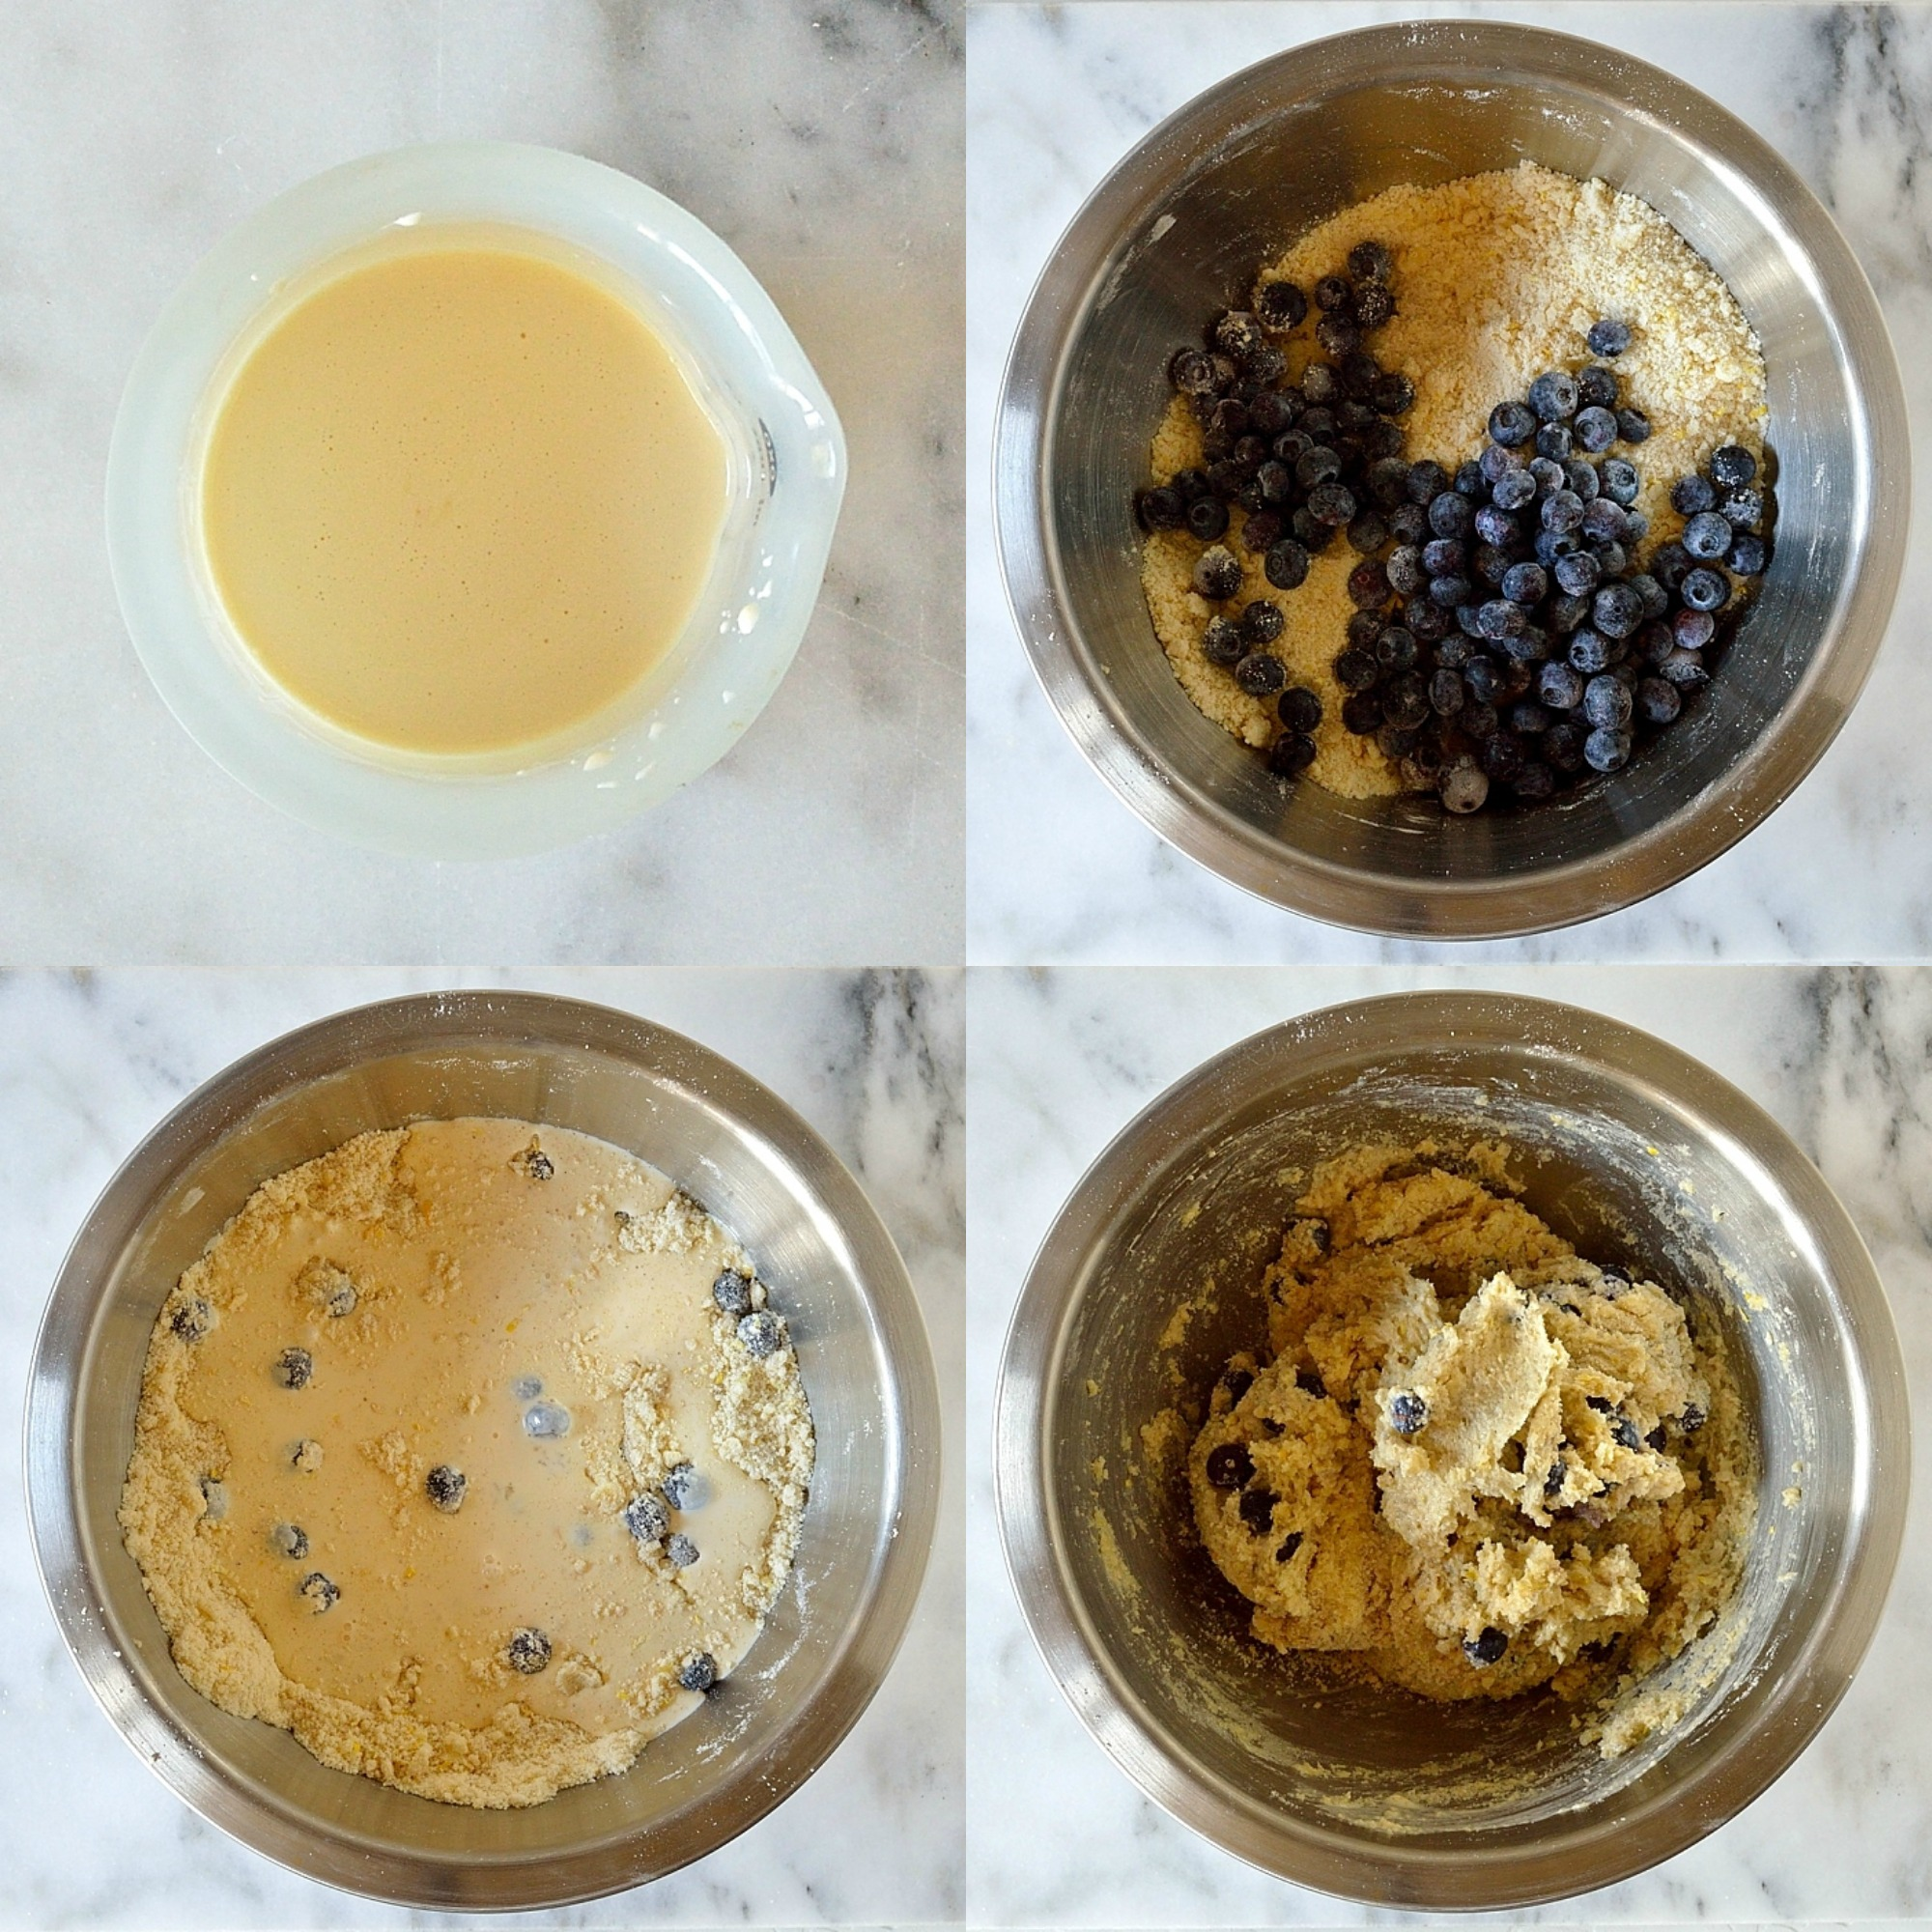 Lemon blueberry cardamom scones step 2